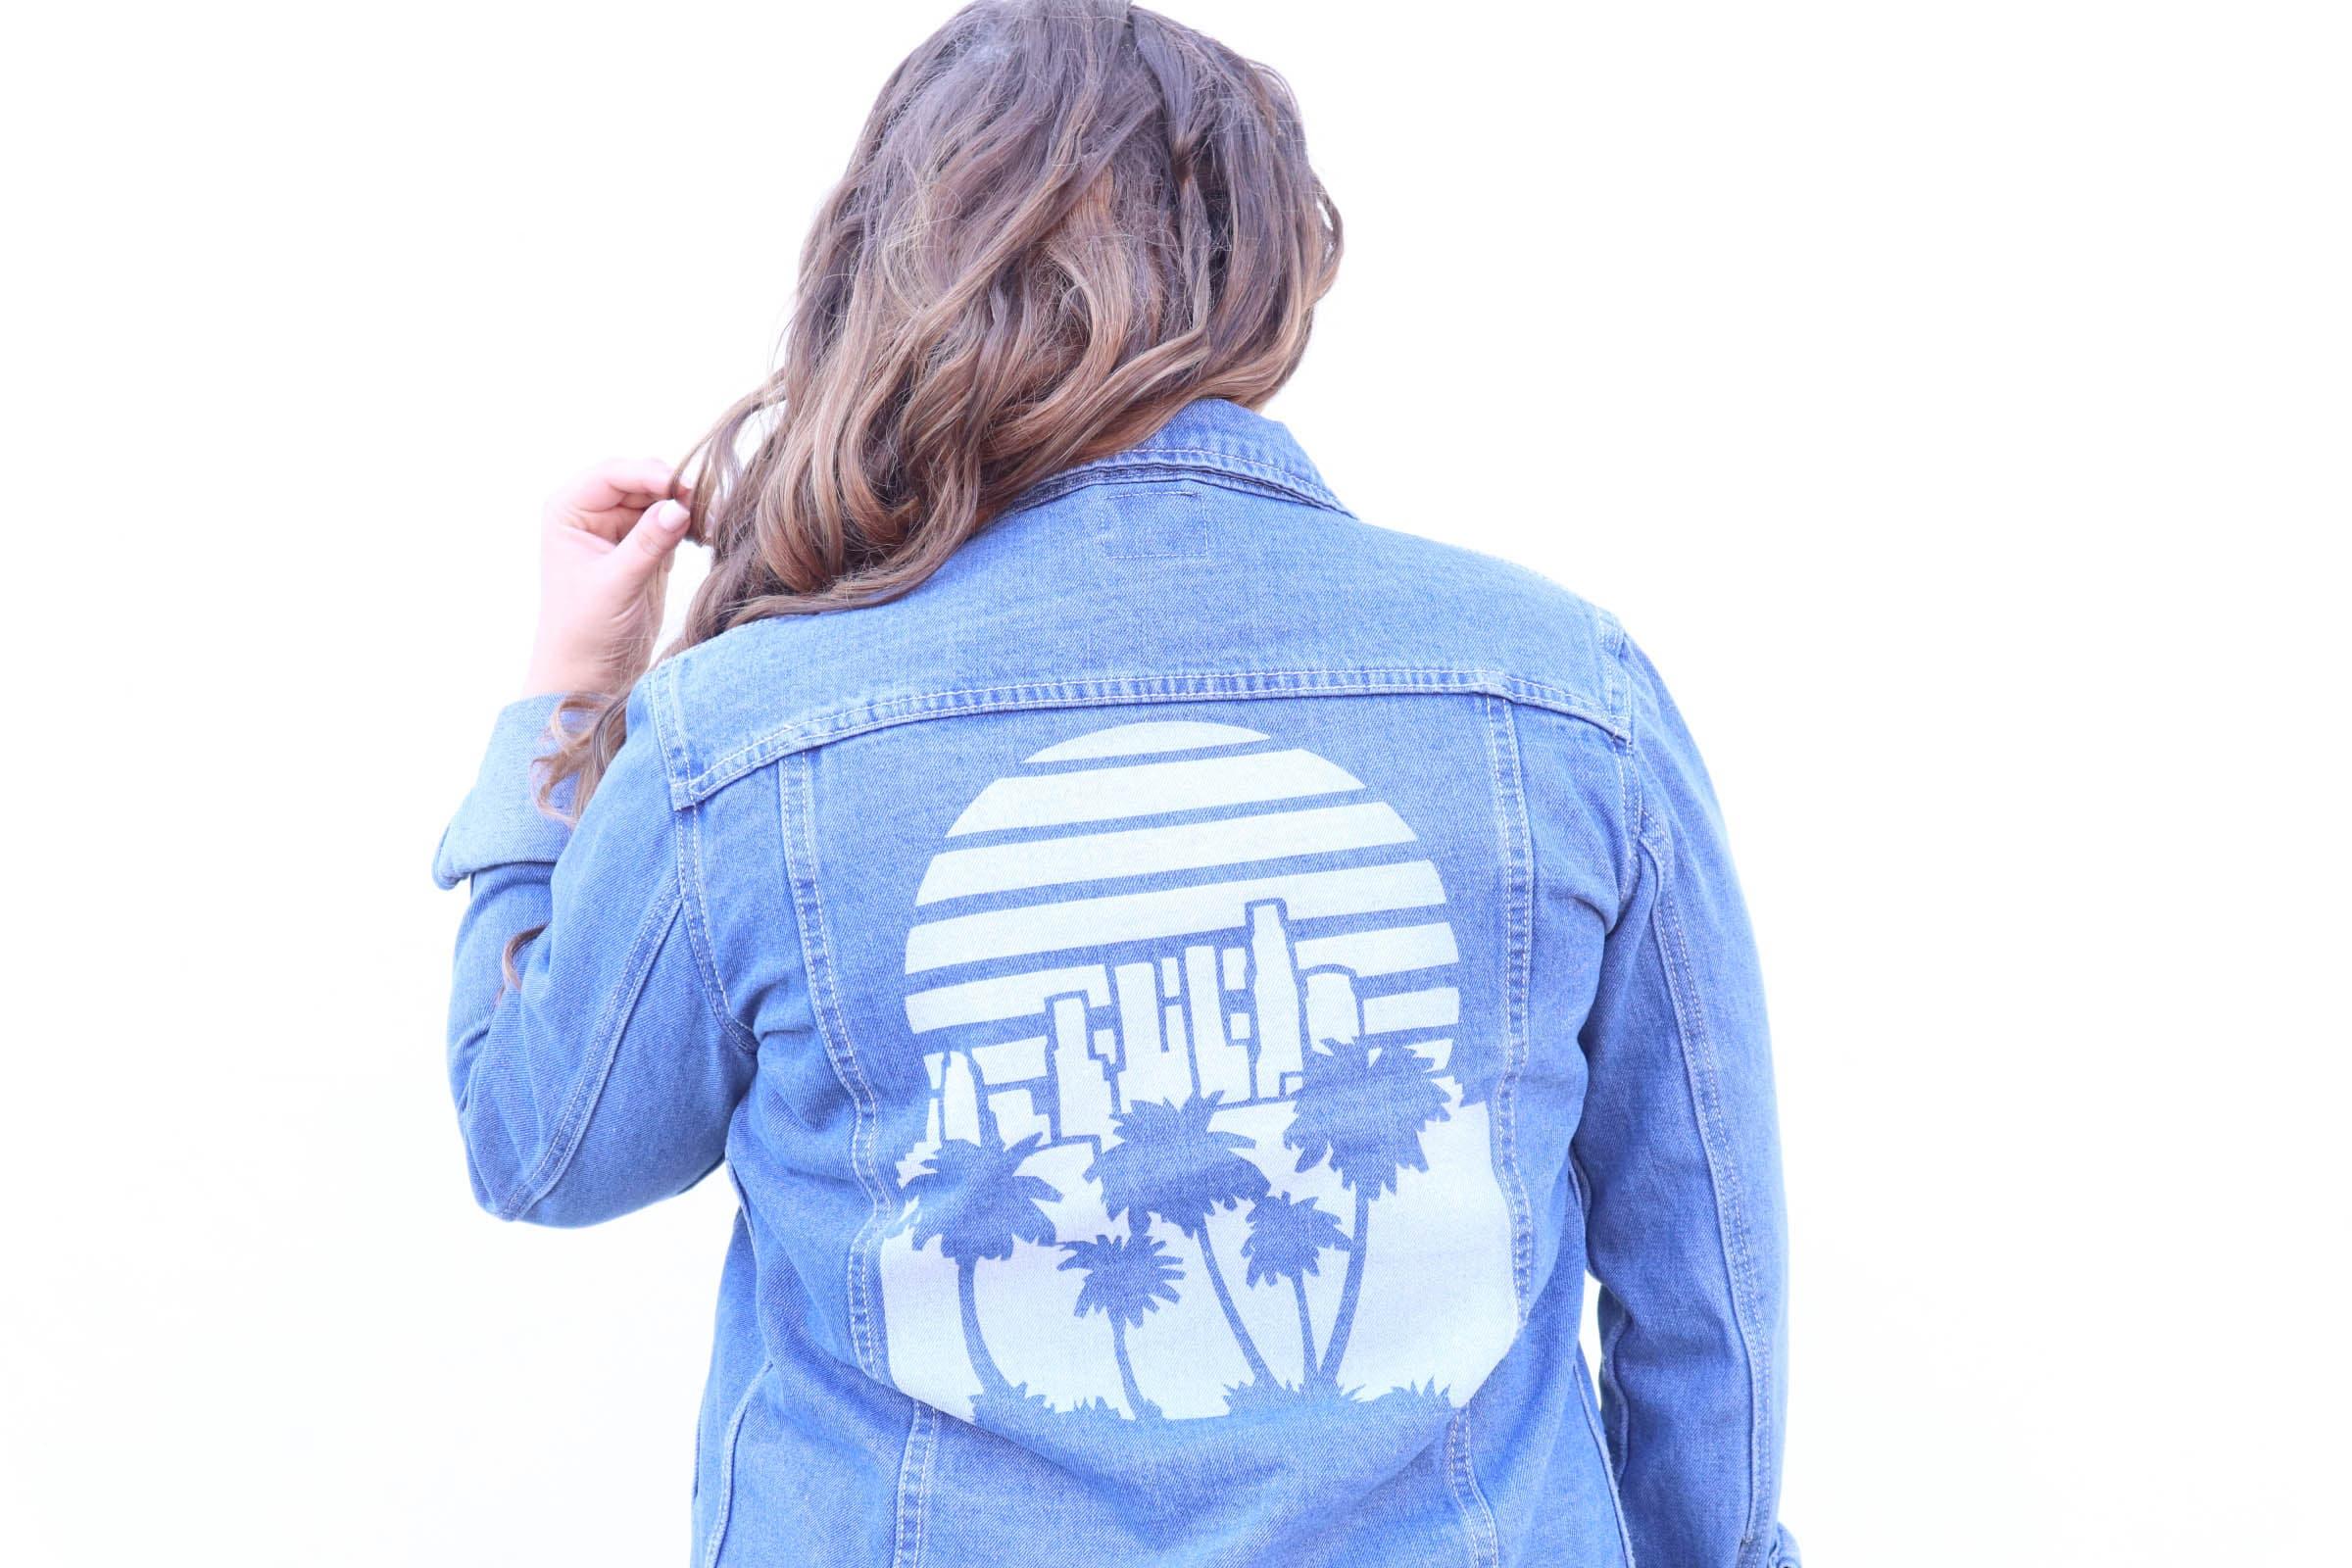 missyonmadison, missy on madison instagram, fashion blogger, la blogger, style blogger, white mountain shoes, white mountain wedges, espadrille wedges, lace babydoll dress, cream lace babydoll dress, white lace babydoll dress, boohoo denim jacket, coachella 2017, coachella style, festival wear, palm tree jacket, palm tree denim jacket, white wedges, mirrored sunglasses, silver sunglasses, vera bradley, vera bradley backpack, brunette hair, clip in hair extensions, boyfriend denim jacket, festival style 2017,